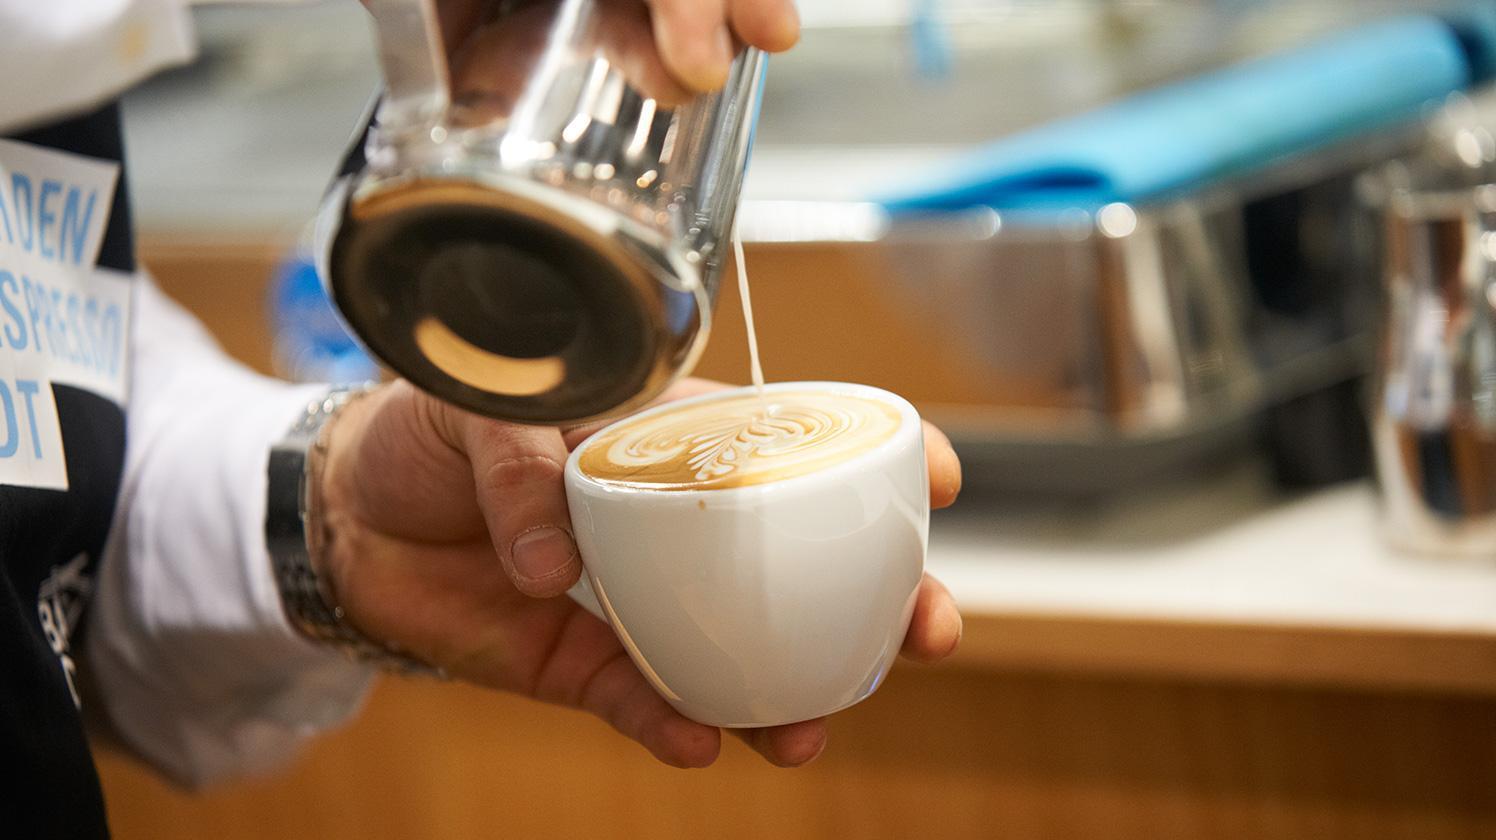 BRITA Filter AquaGusto Barista Cappuccino